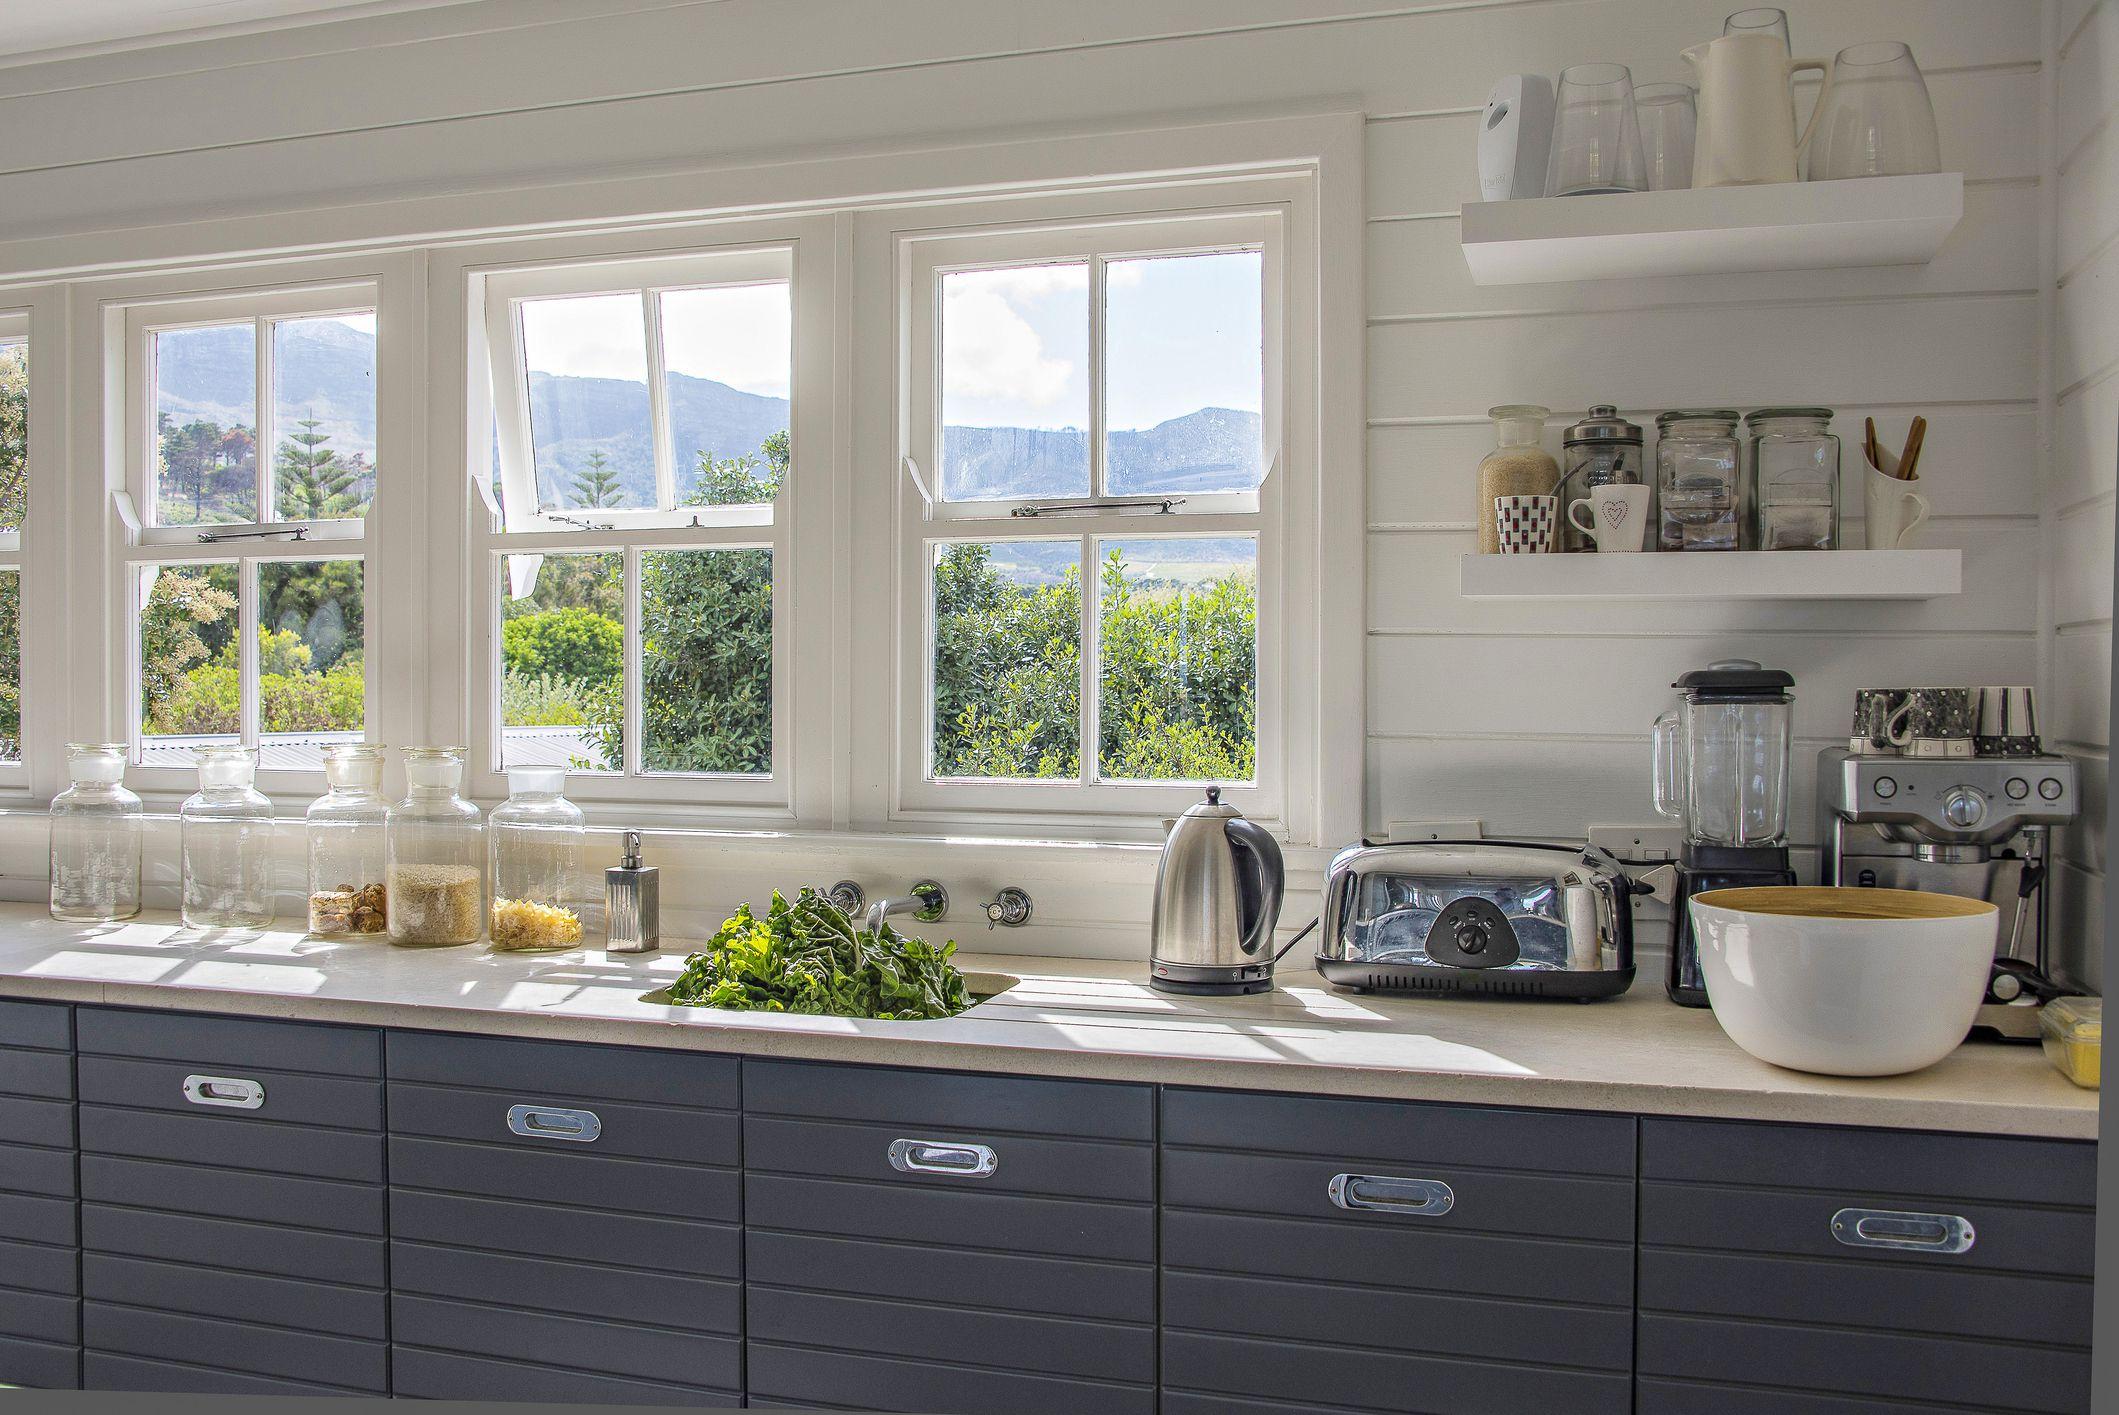 breakfast ideas bar entity home kitchen design counter organization tables diy